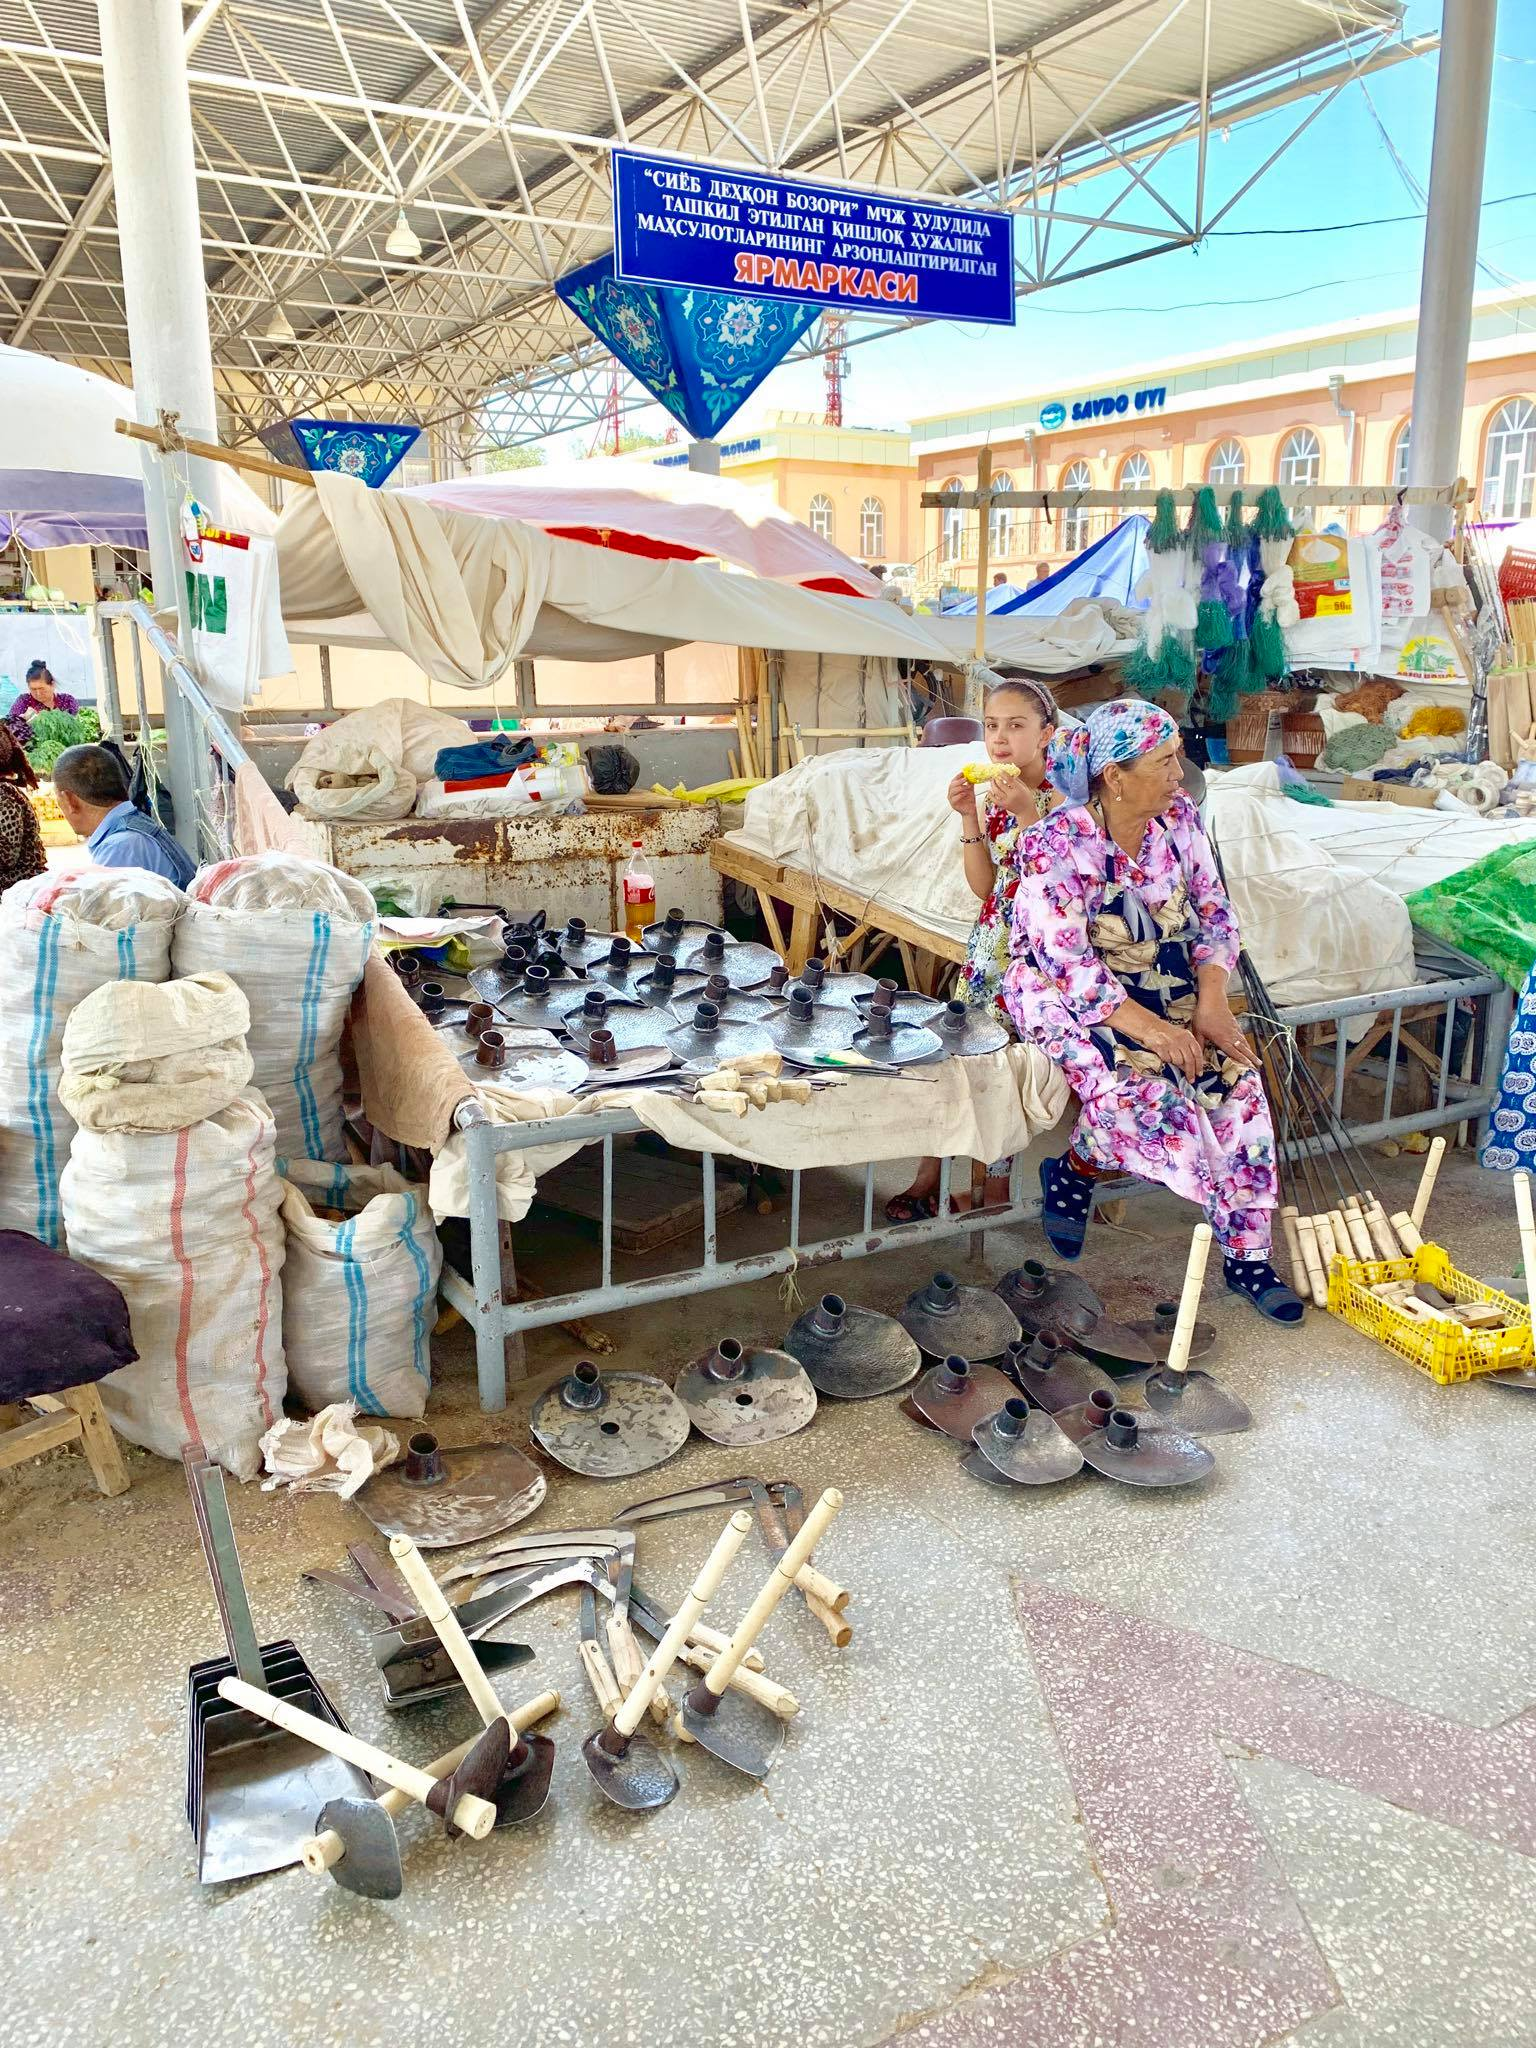 Kach Solo Travels in 2019 Siyab Bazaar and Registan on my first day in Samarkand21.jpg